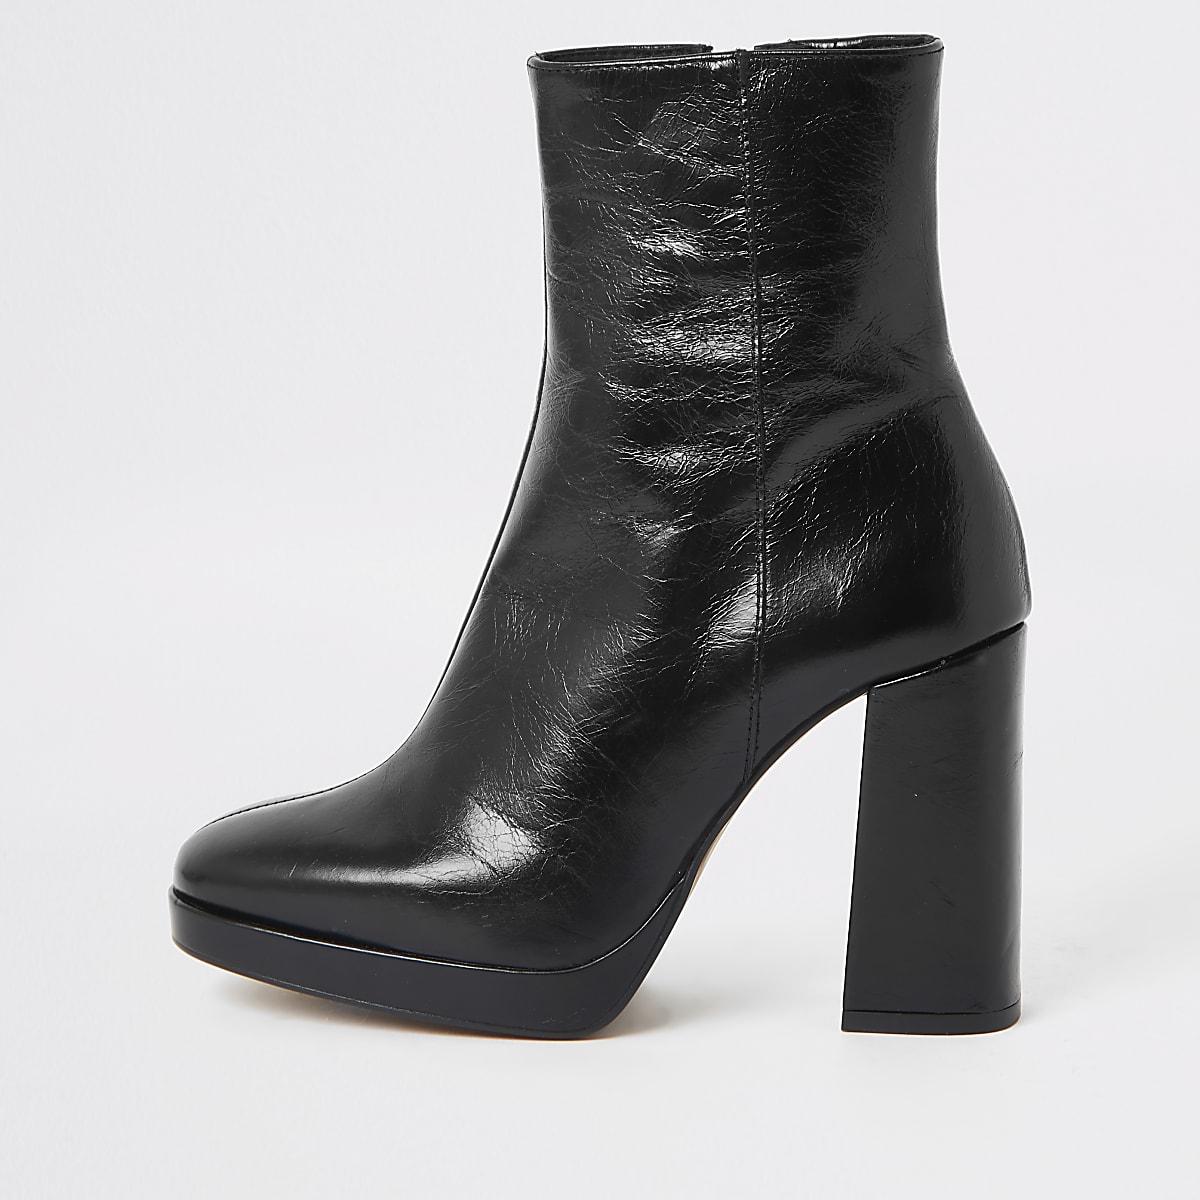 Black leather block heel sock boot